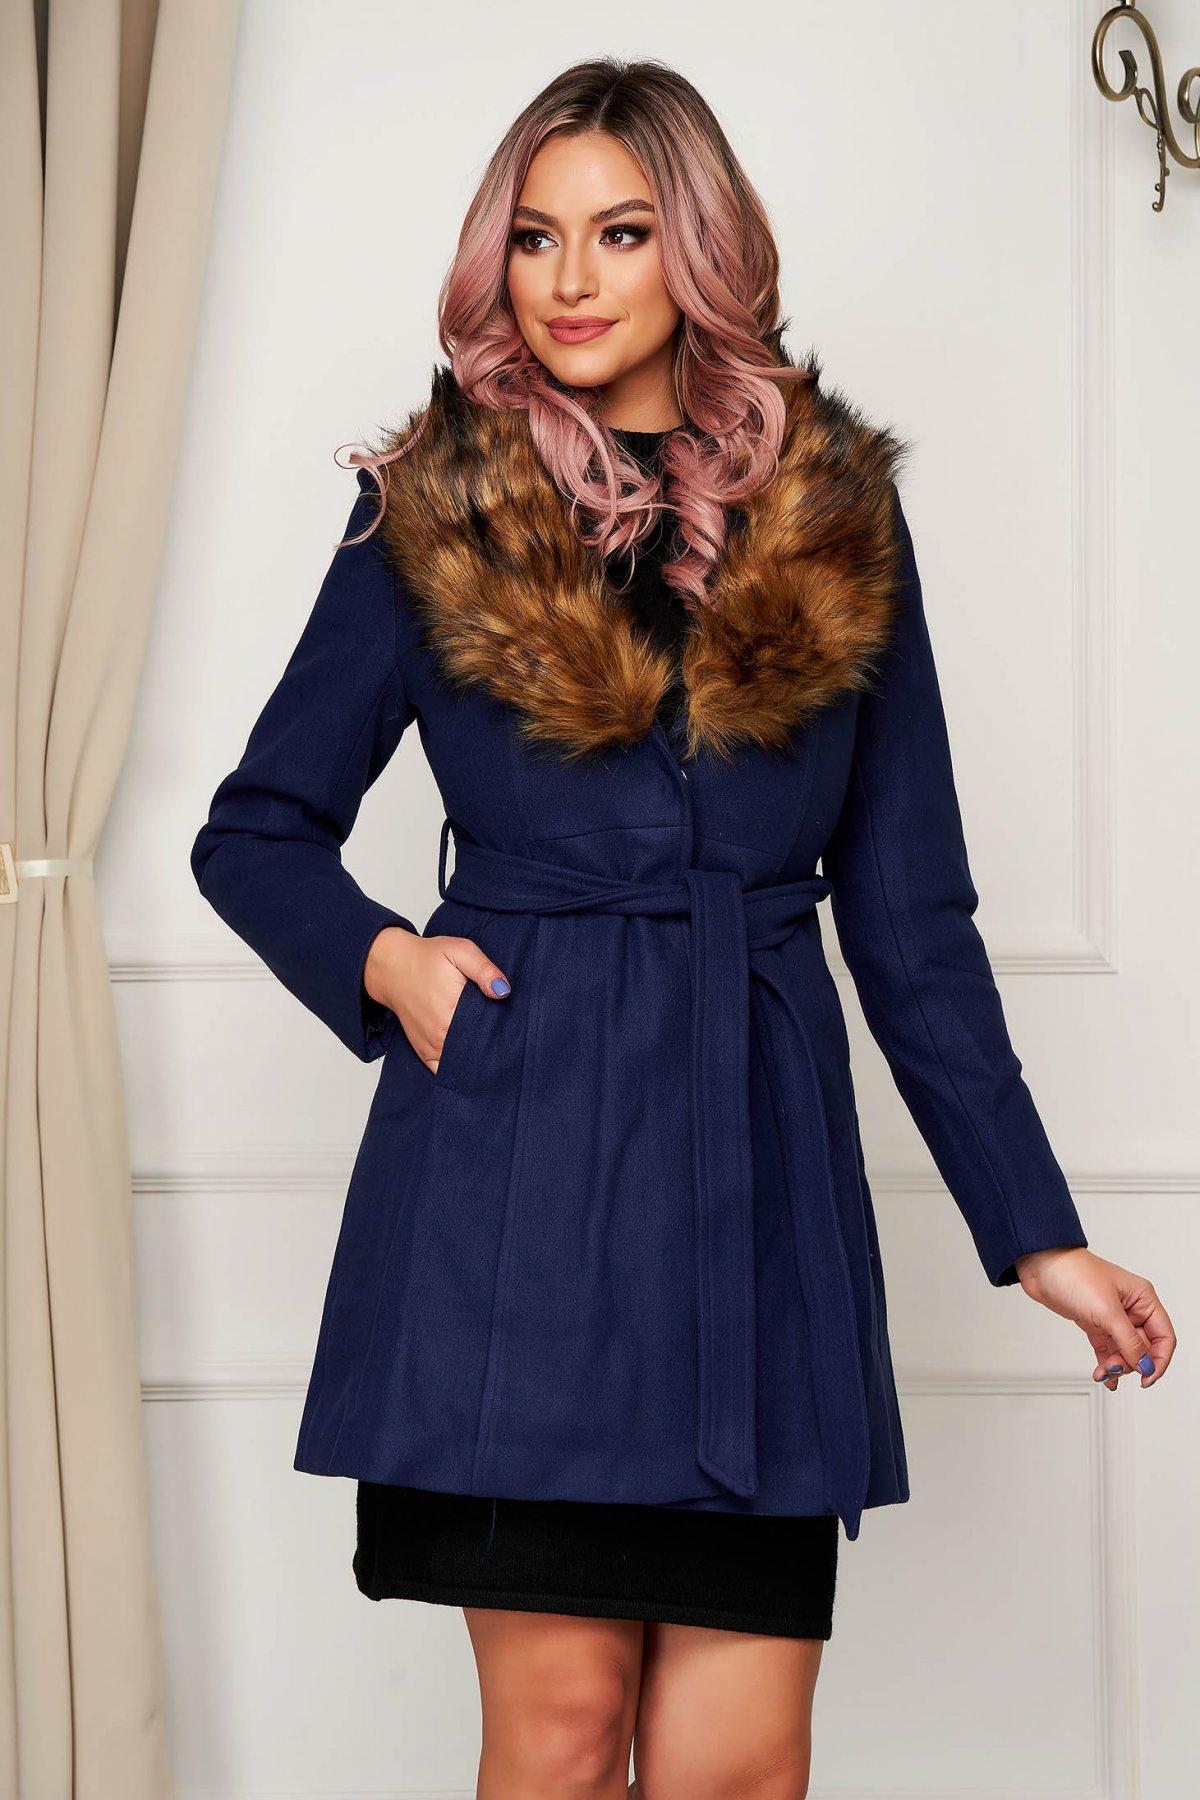 Palton Albastru Din Lana Elegant In Clos Cu Guler Din Blana Artificiala Si Buzunare